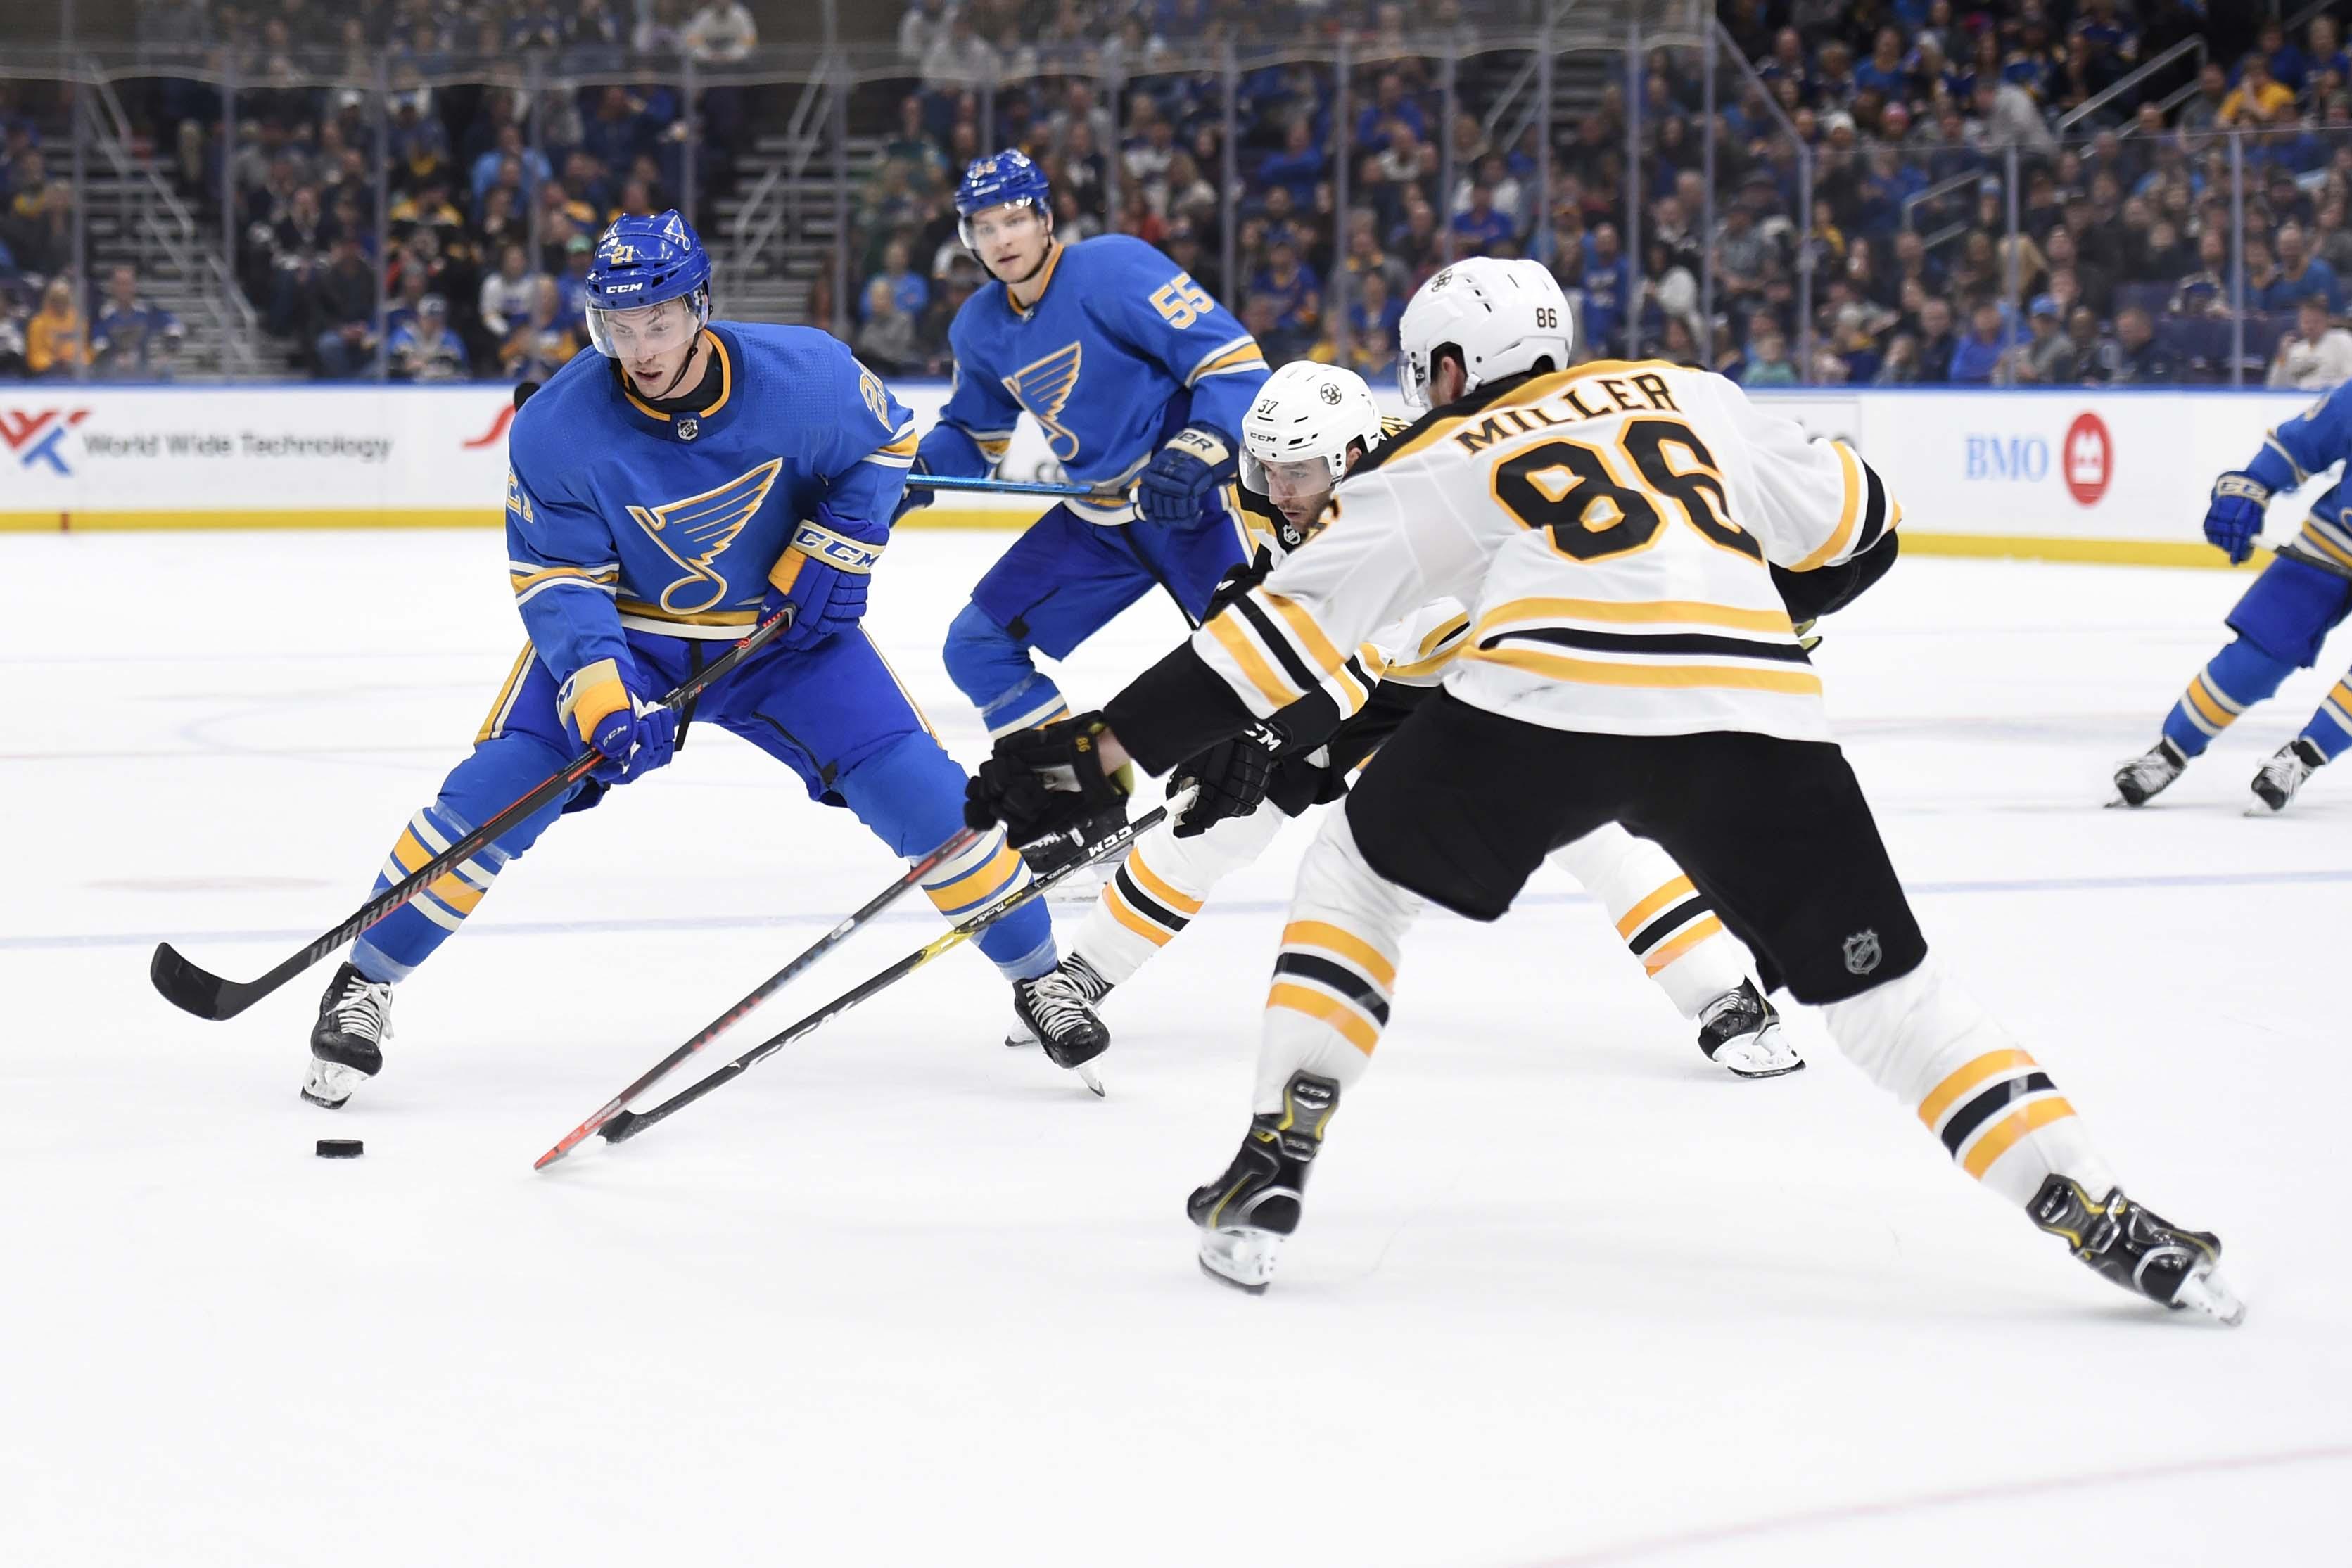 Feb 23, 2019; St. Louis, MO, USA; Boston Bruins defenseman Kevan Miller (86) defends against St. Louis Blues center Tyler Bozak (21) during the second period at Enterprise Center. Mandatory Credit: Joe Puetz